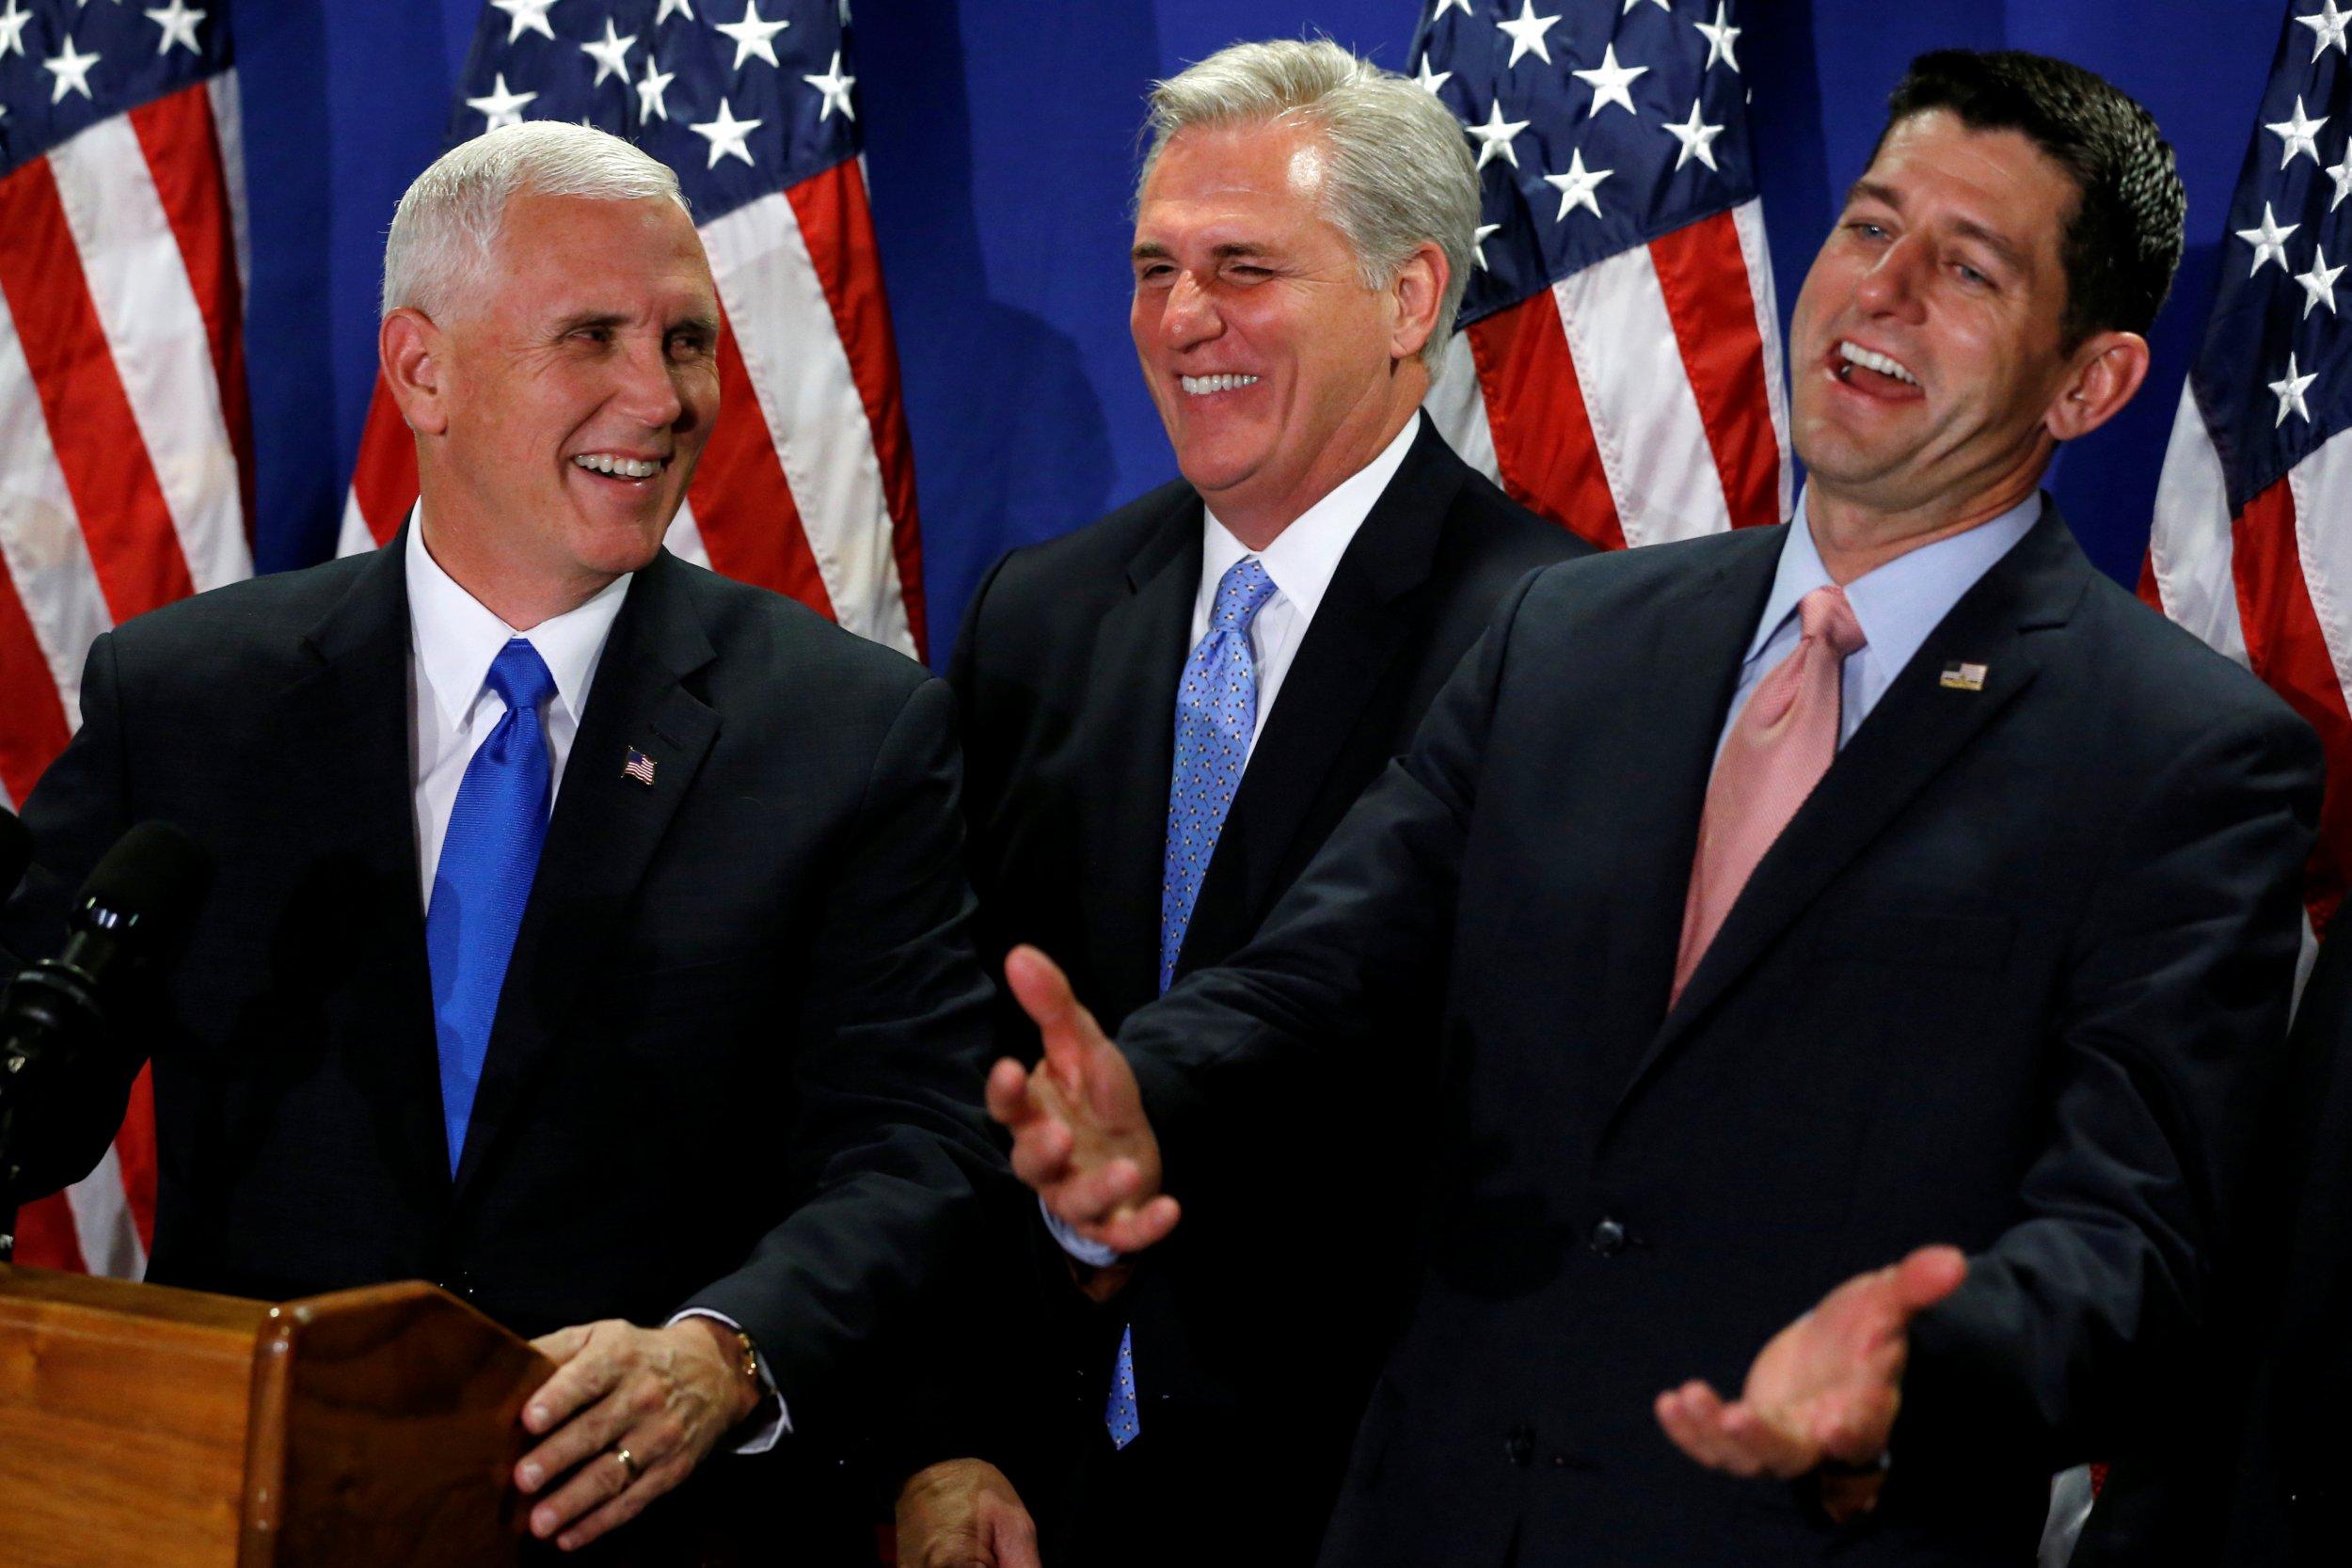 Mike Pence, Kevin McCarthy and Paul Ryan laugh